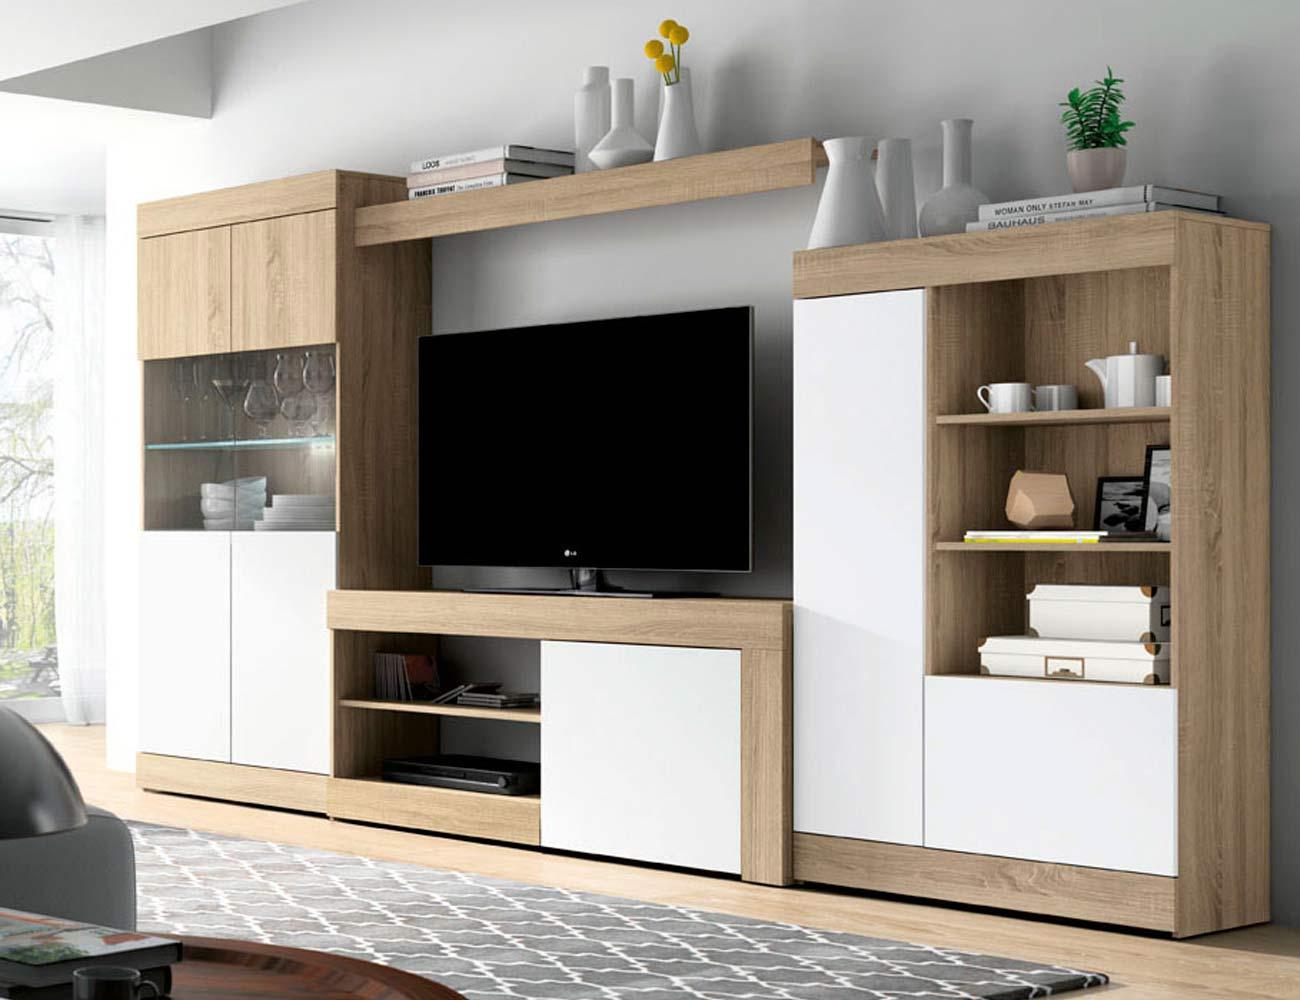 mueble de saln comedor estilo moderno en cambrian con luces leds ud muebles comedor kit